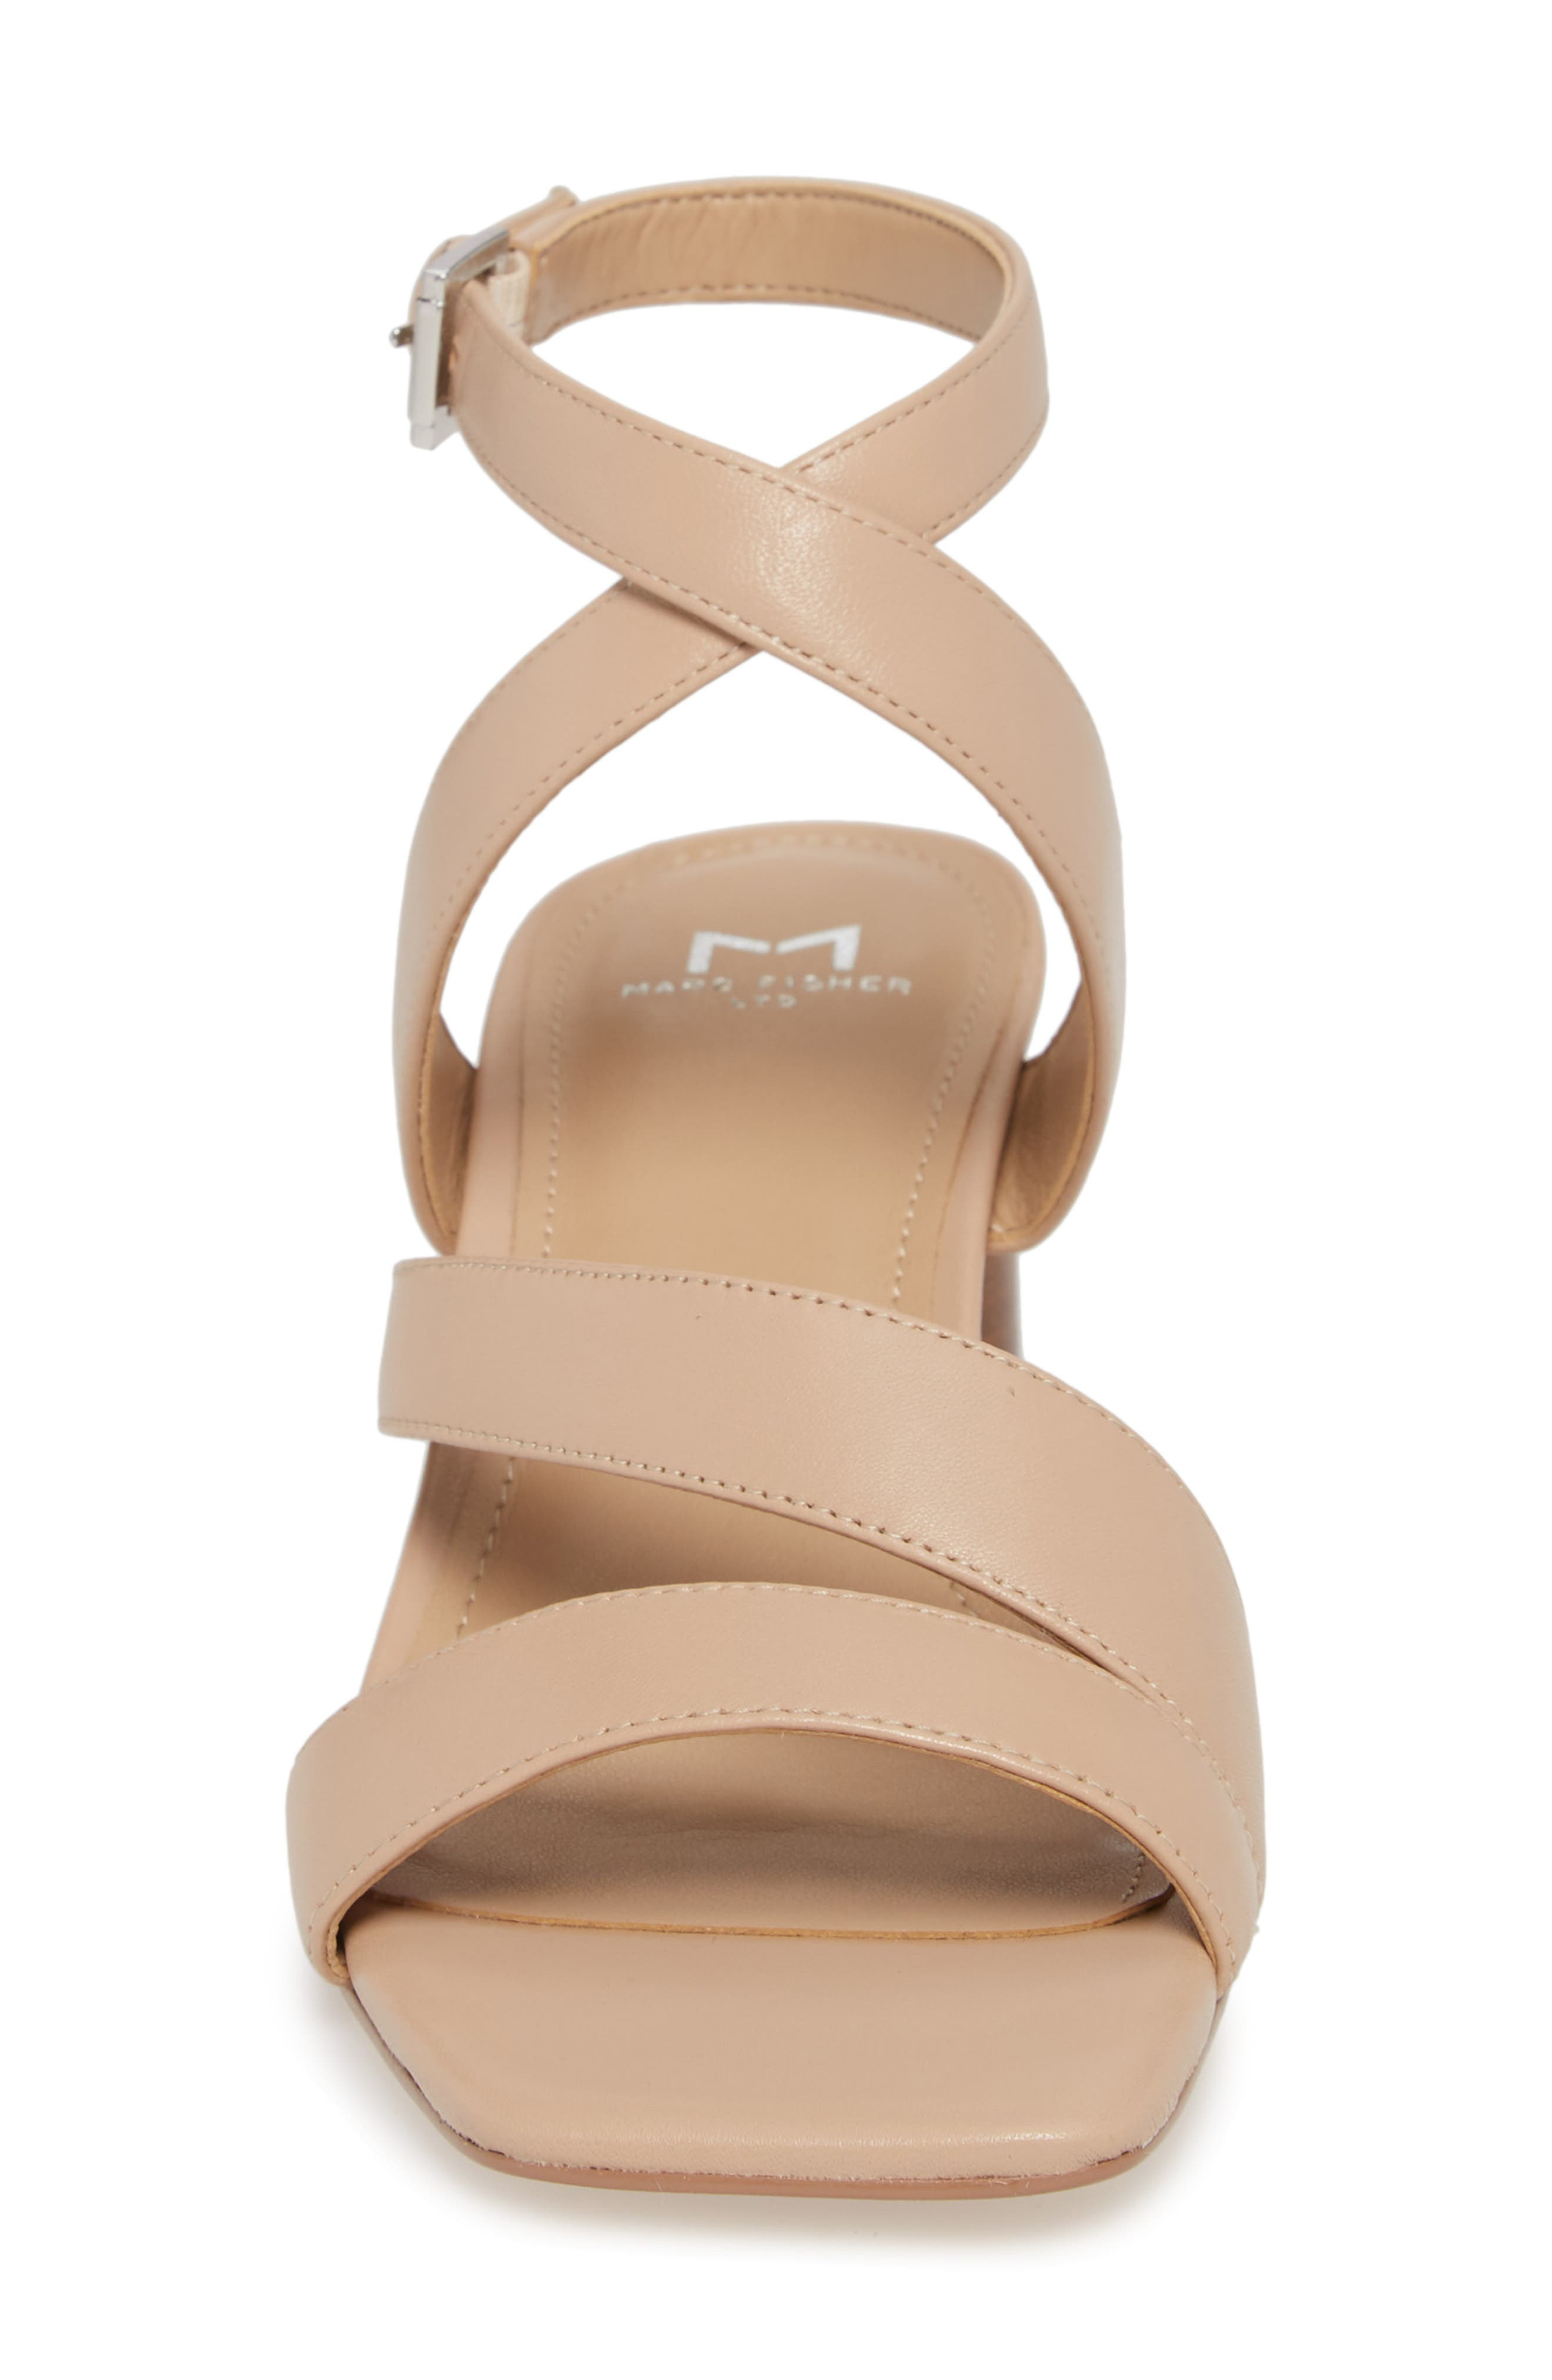 Marc Fischer LTD Idana Strappy Sandal,                             Alternate thumbnail 4, color,                             Lite Latte Leather